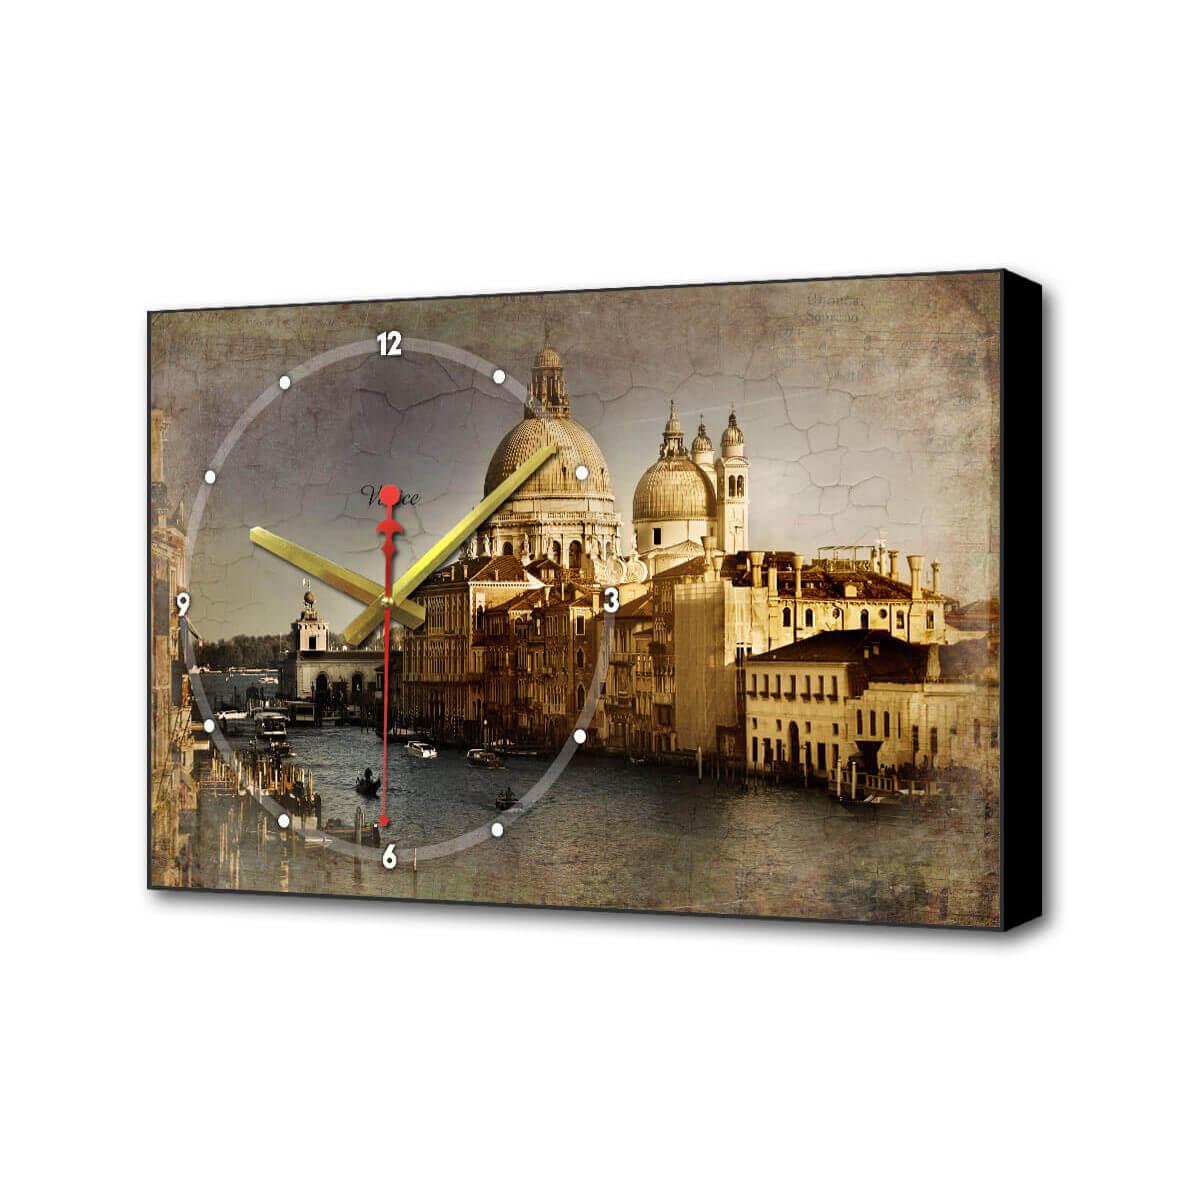 Настенные часы Венеция III Timebox Toplight 37х60х4см TL-C5014 все цены